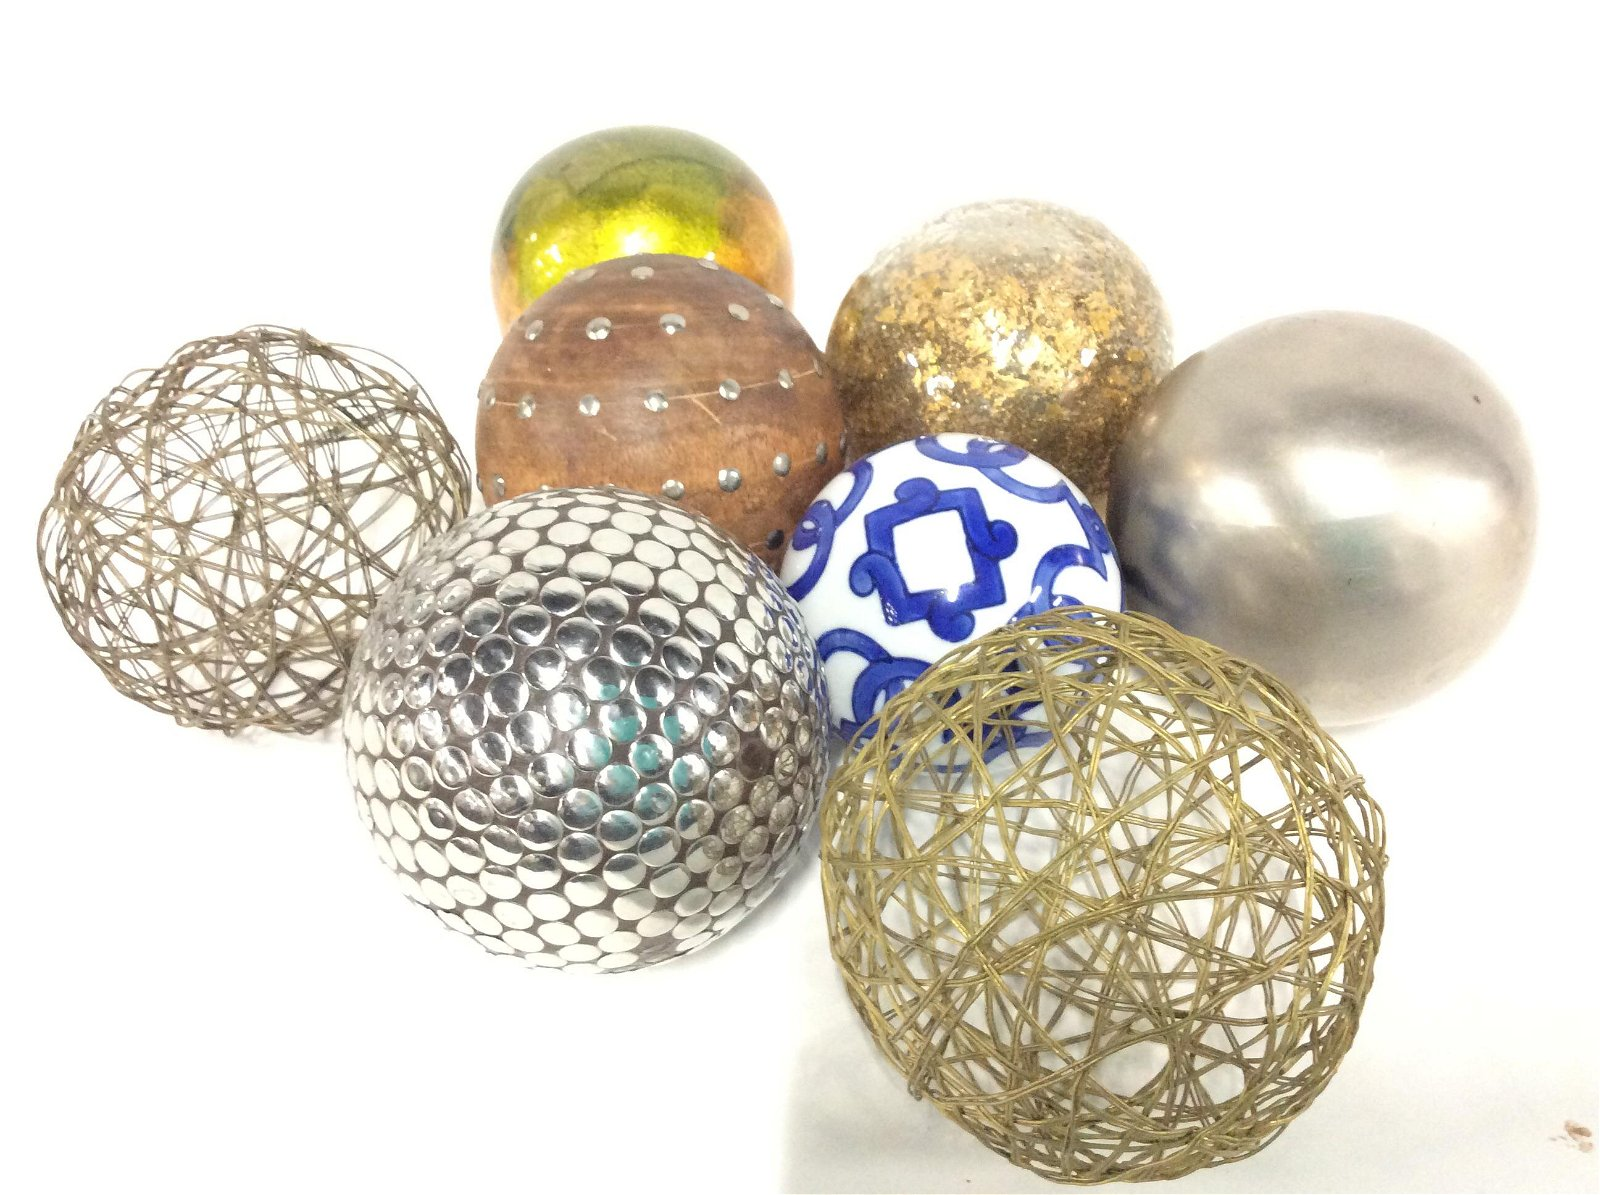 Lot 8 Decor Table Spheres, Mixed Materials